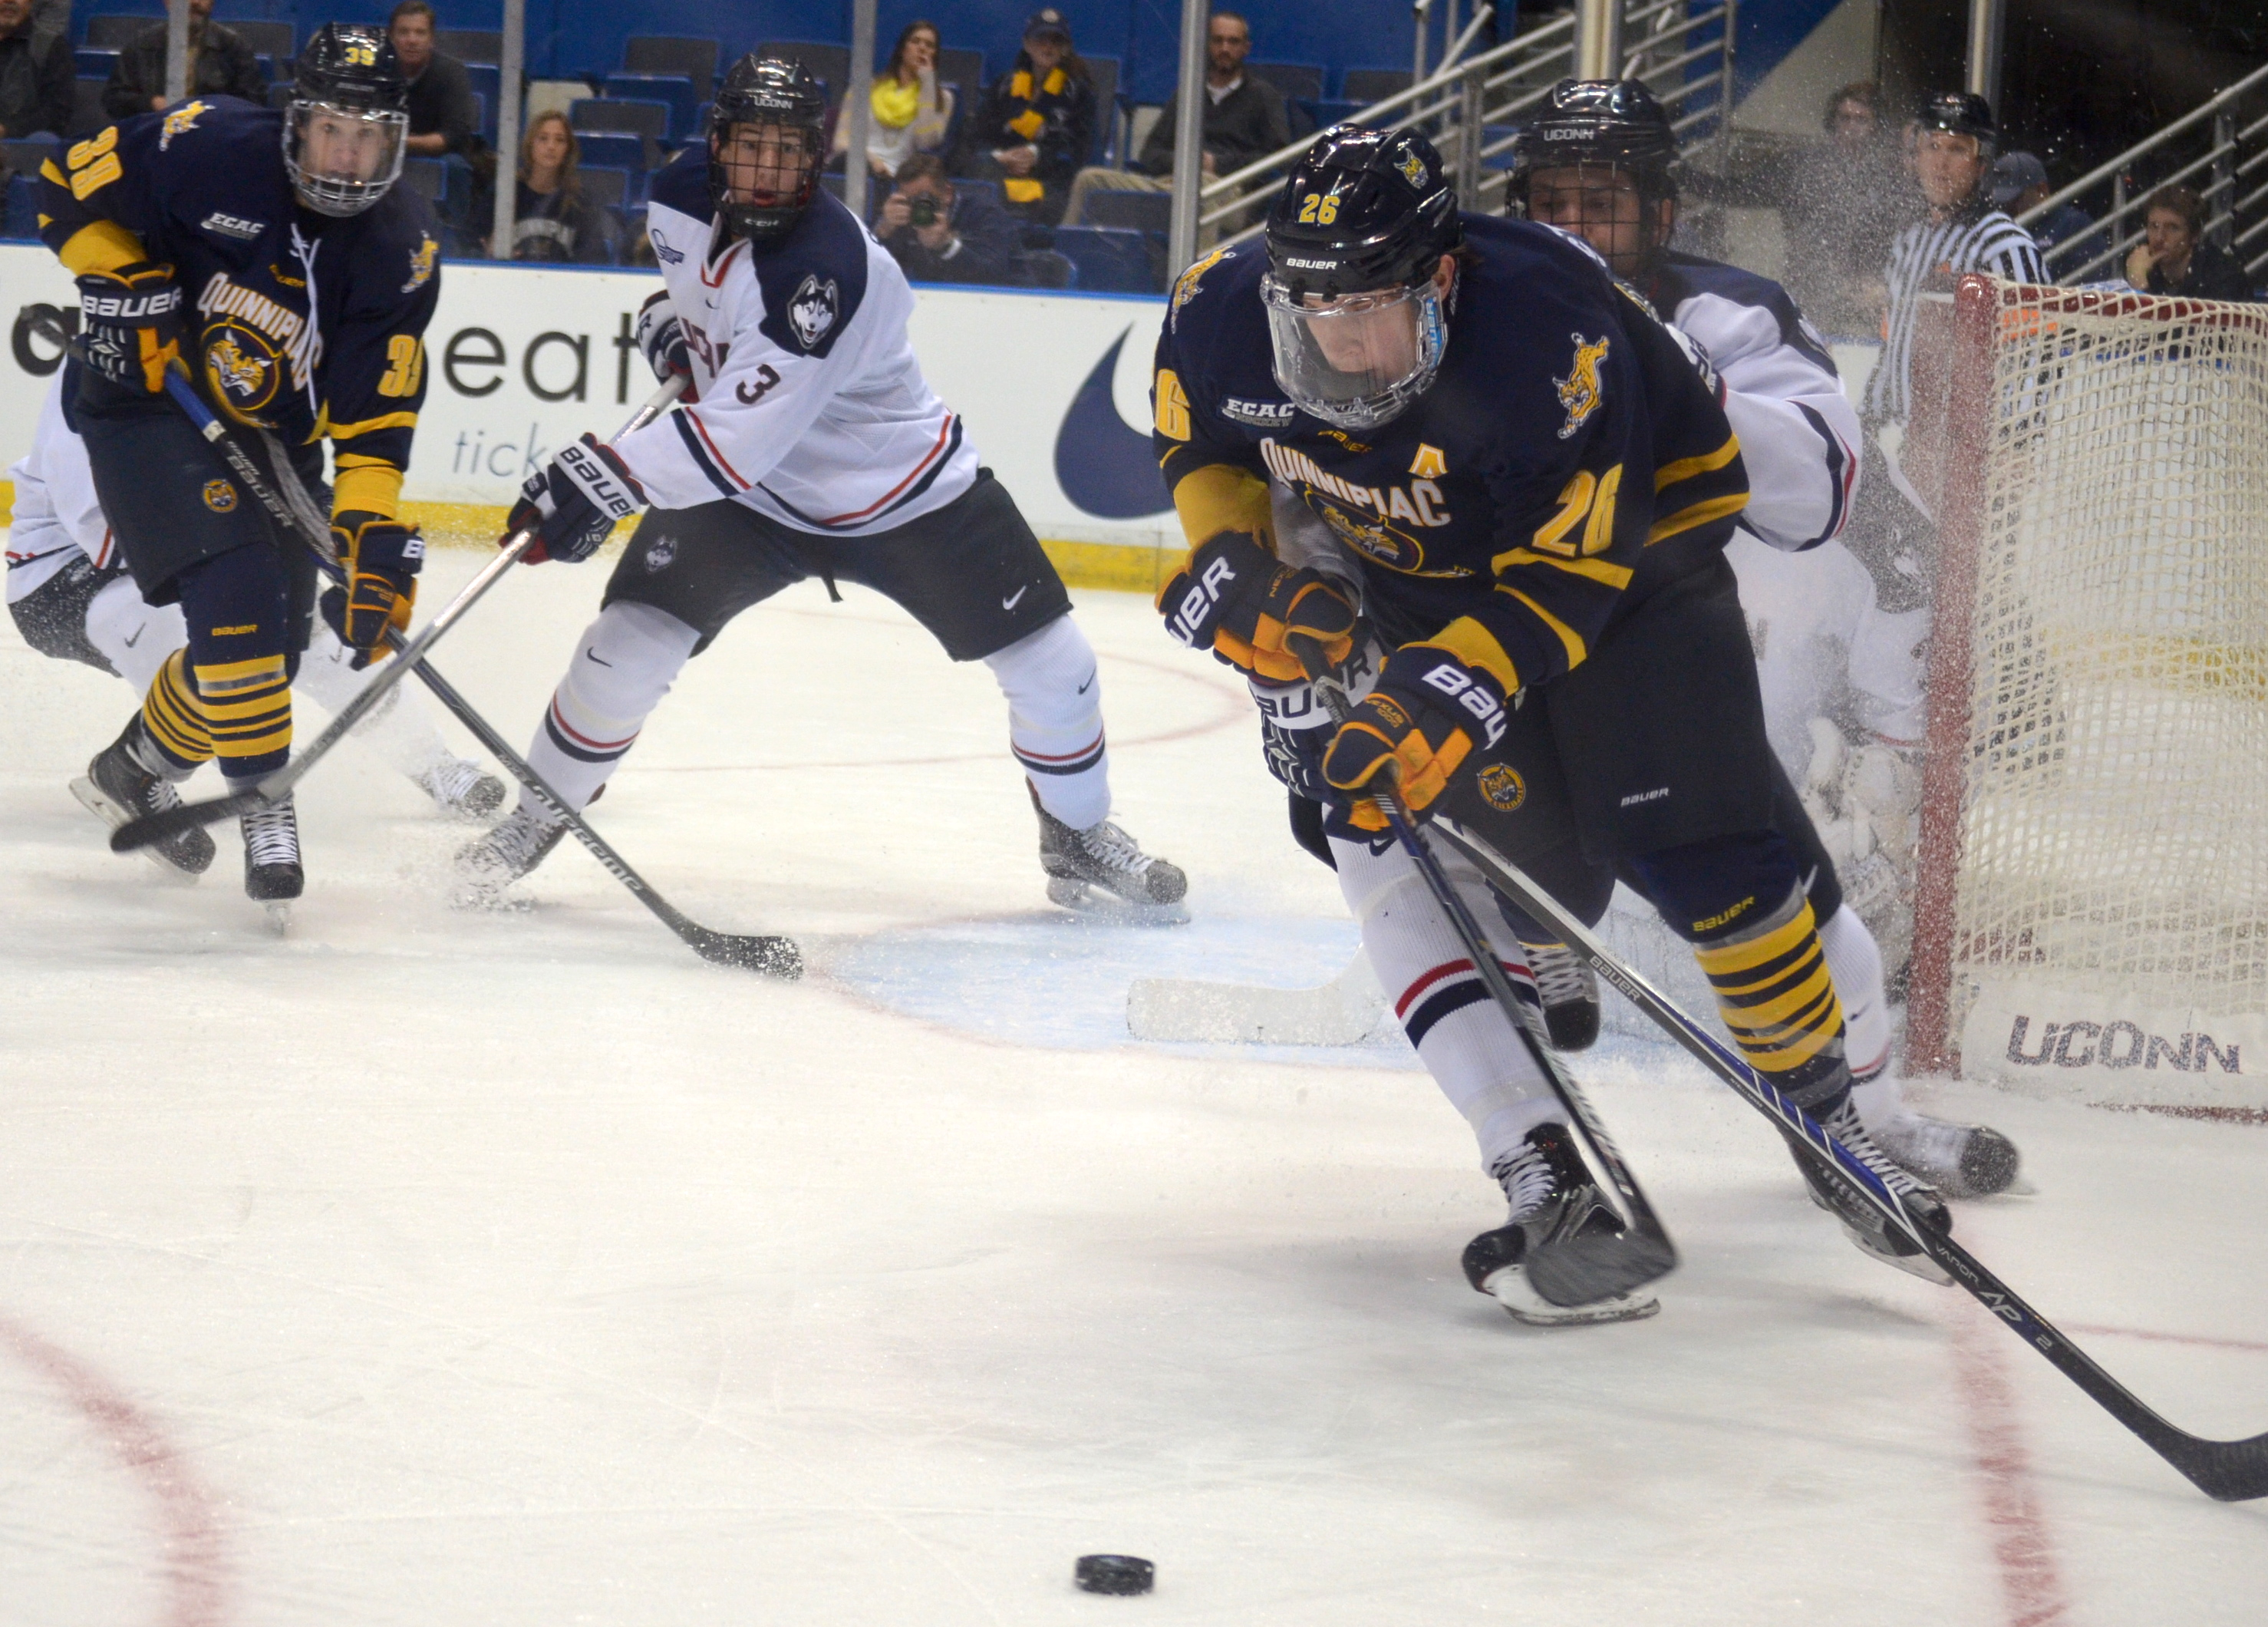 Jordan Novack|Quinnipiac Chronicle Travis St. Dennis carries the puck away from the net vs UConn 11/17/15